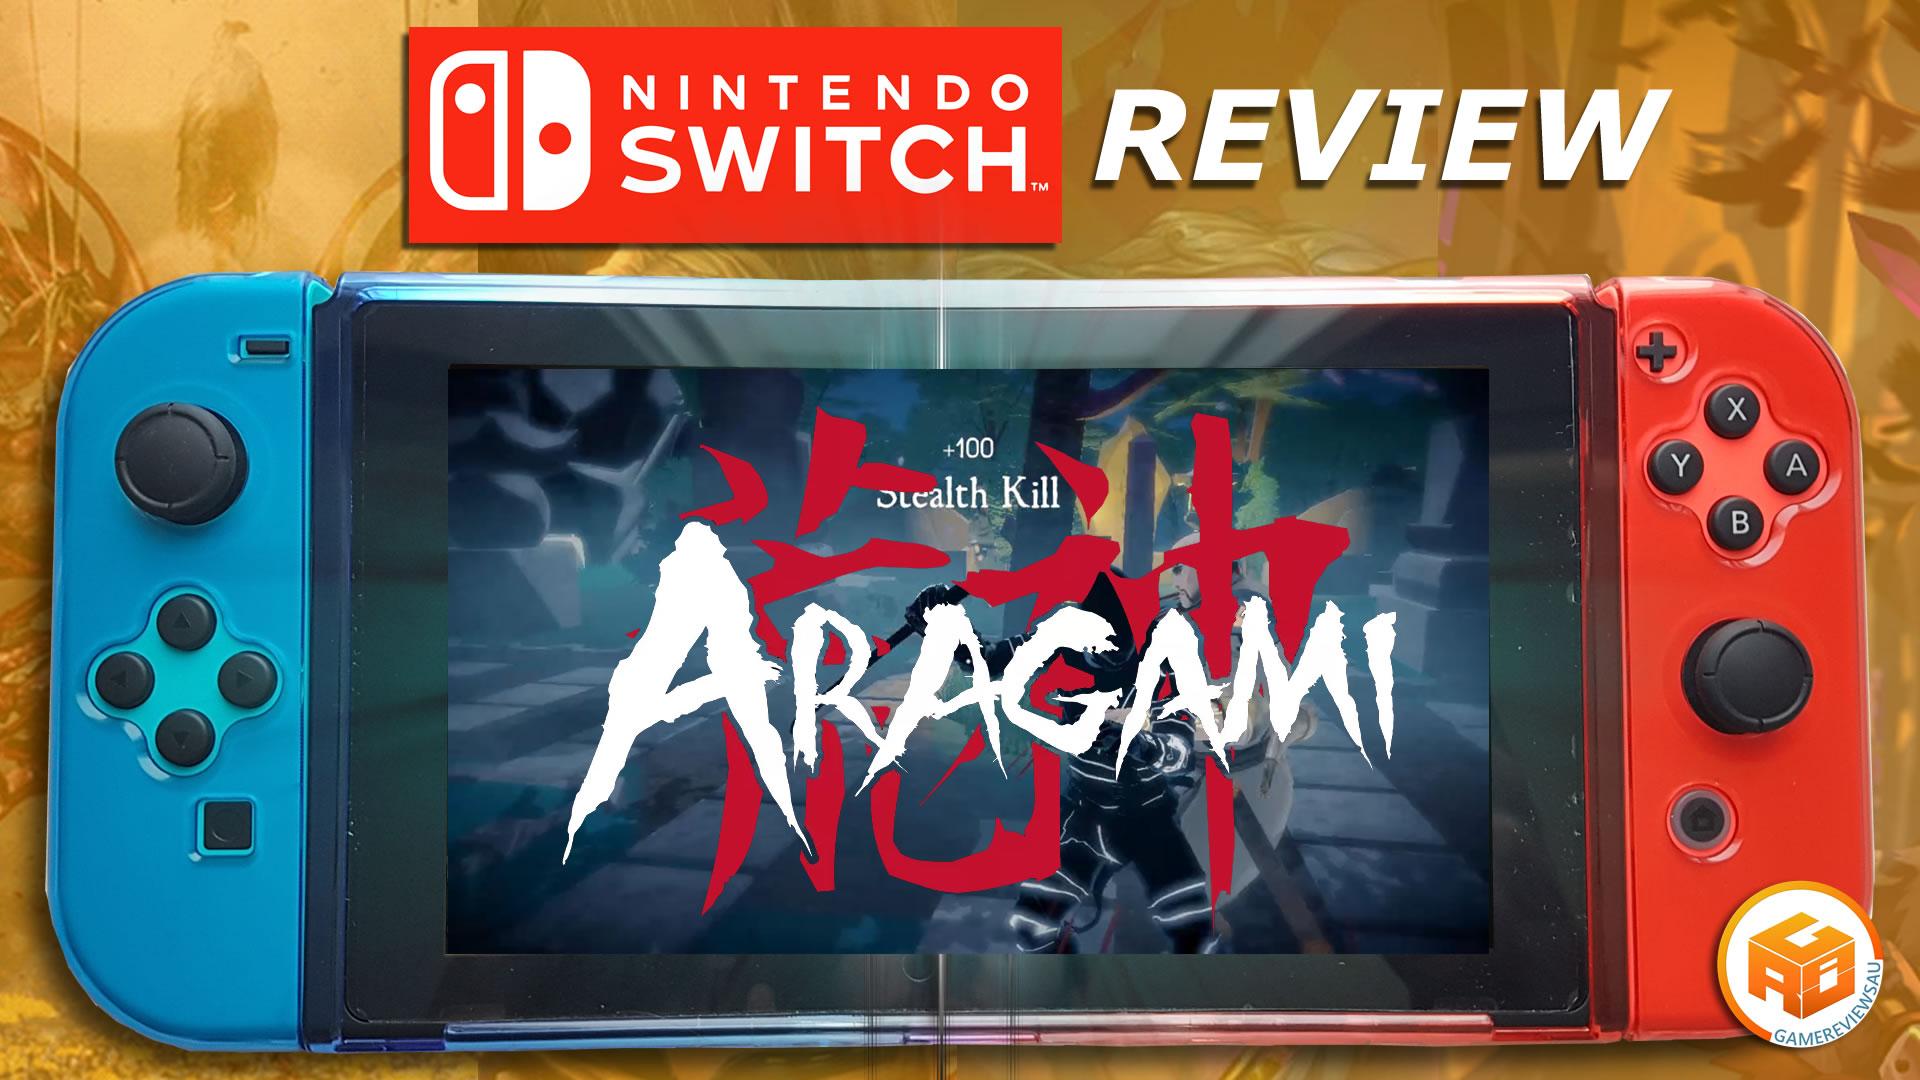 aragami gameplay and review